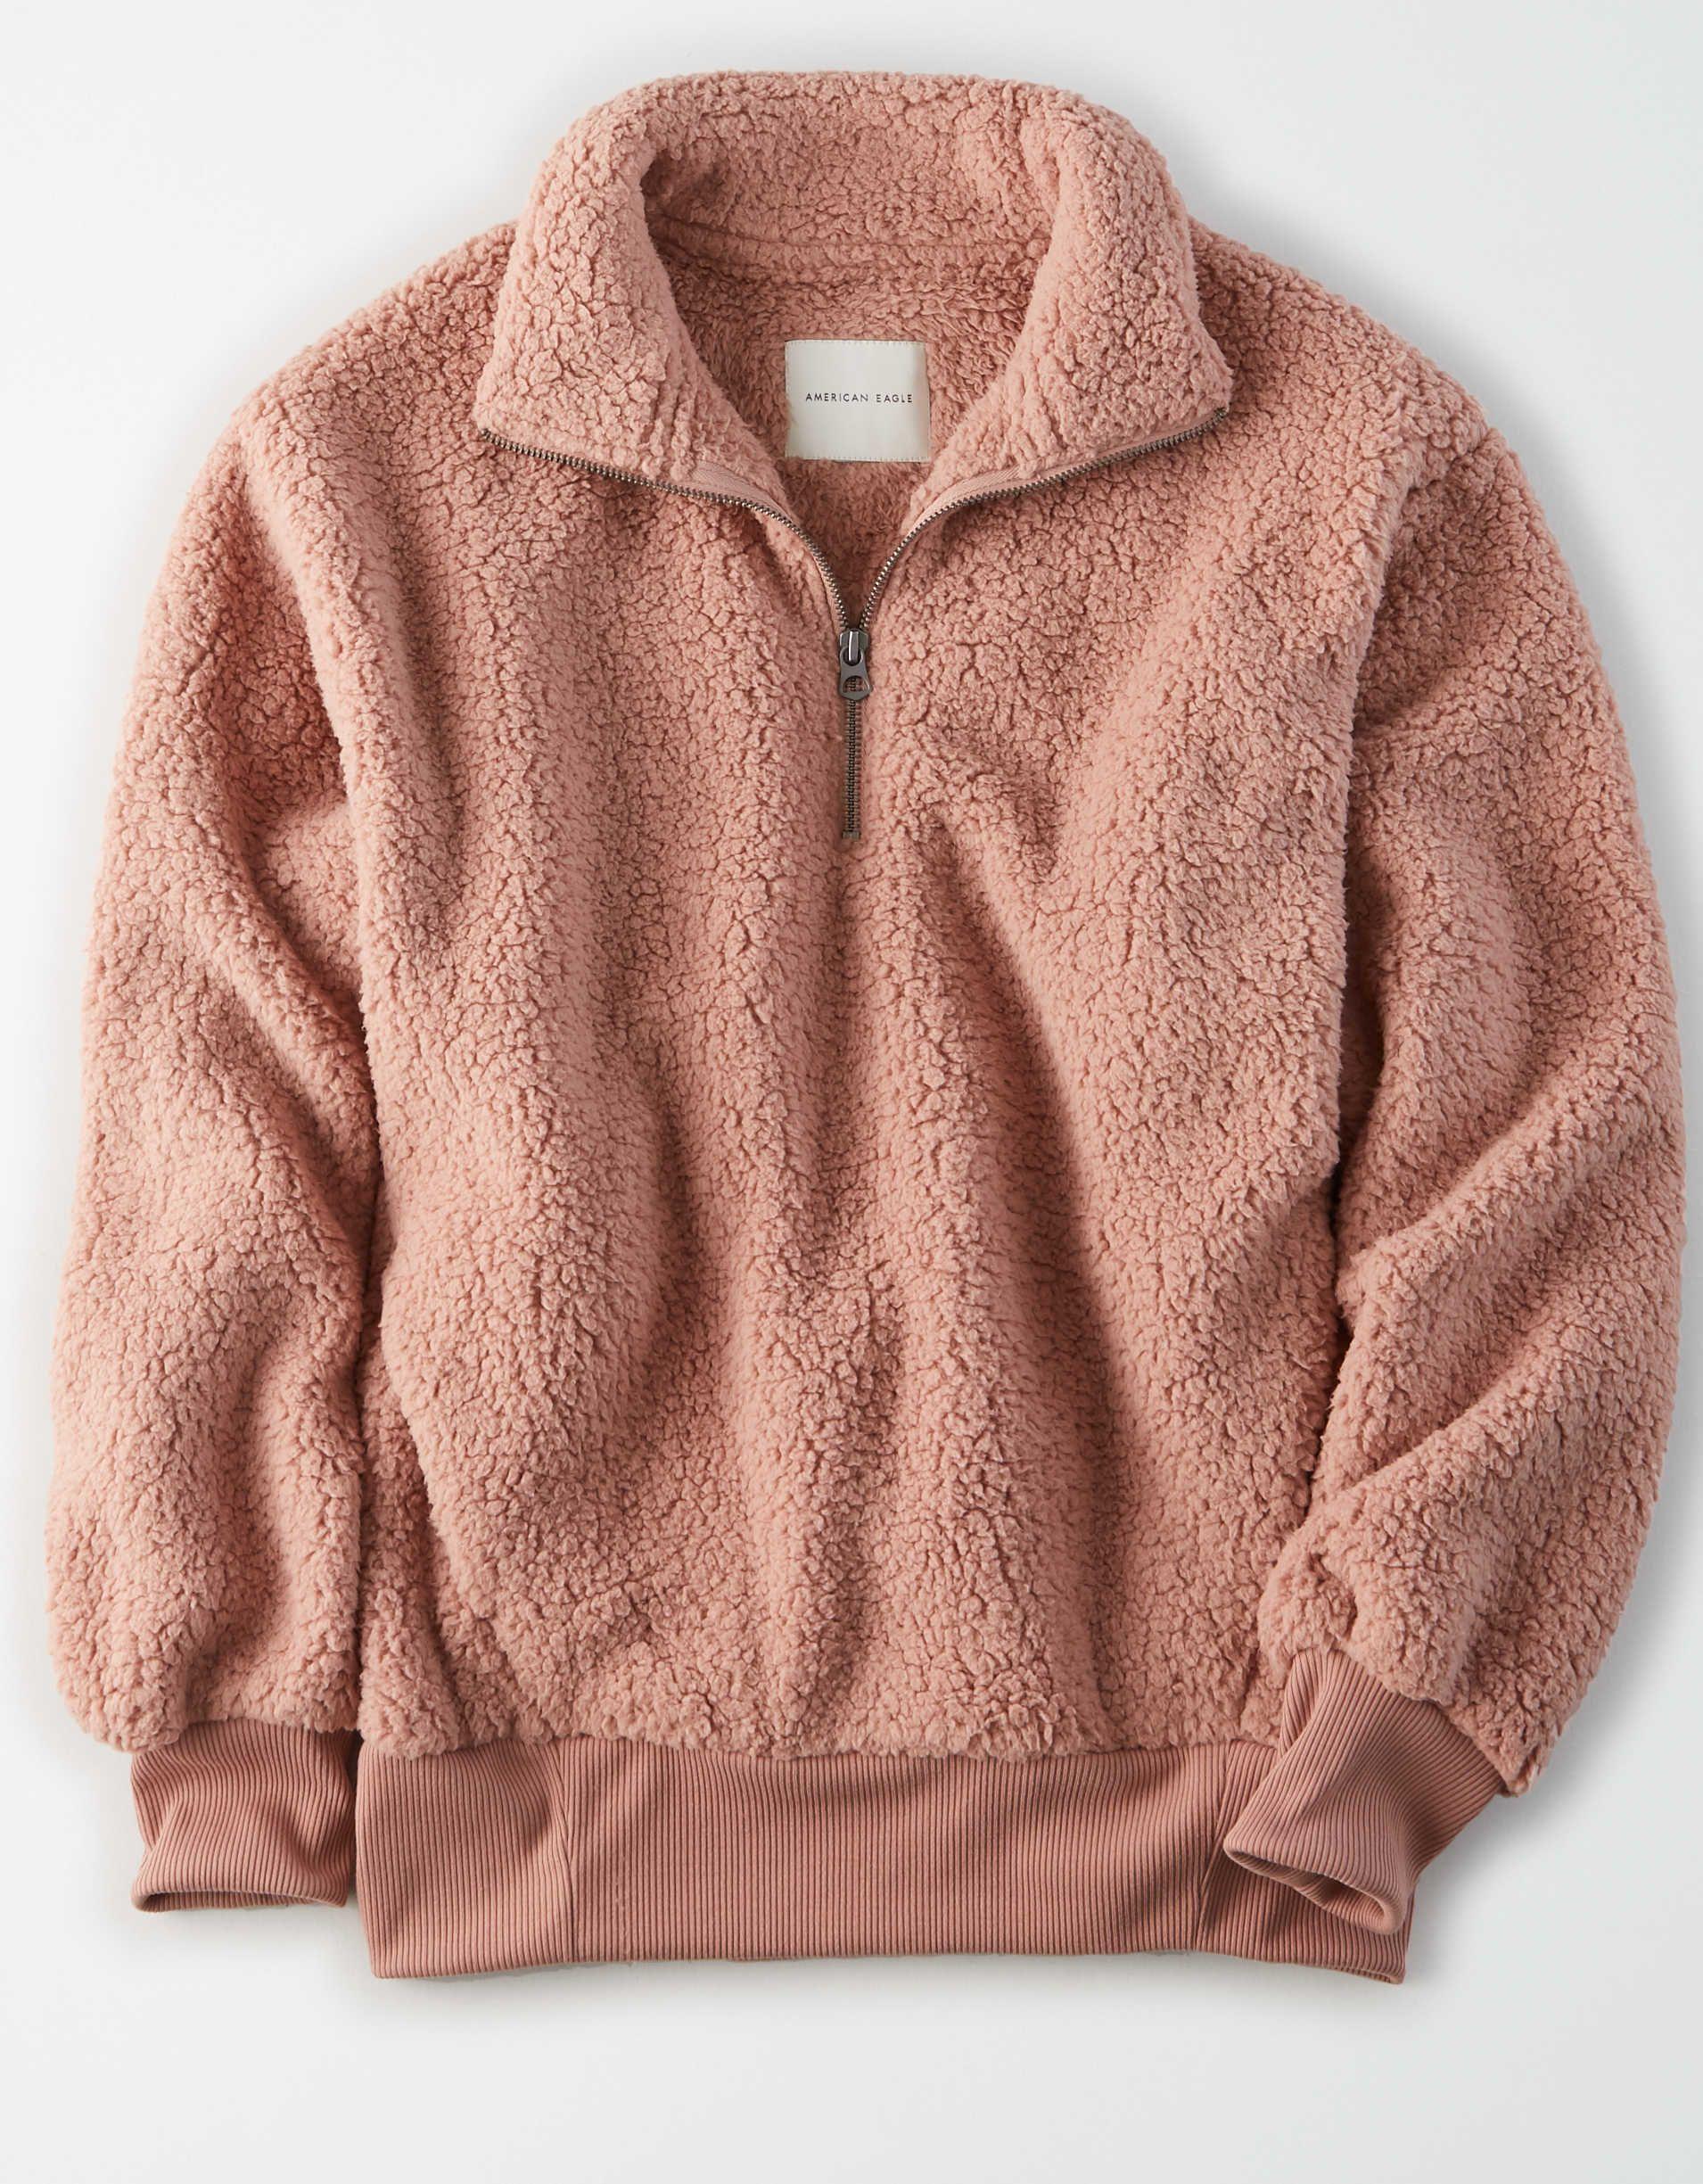 Ae Fuzzy Sherpa Quarter Zip Sweatshirt Pullover Hoodie Outfit Clothes Cozy Sweatshirts [ 2449 x 1910 Pixel ]